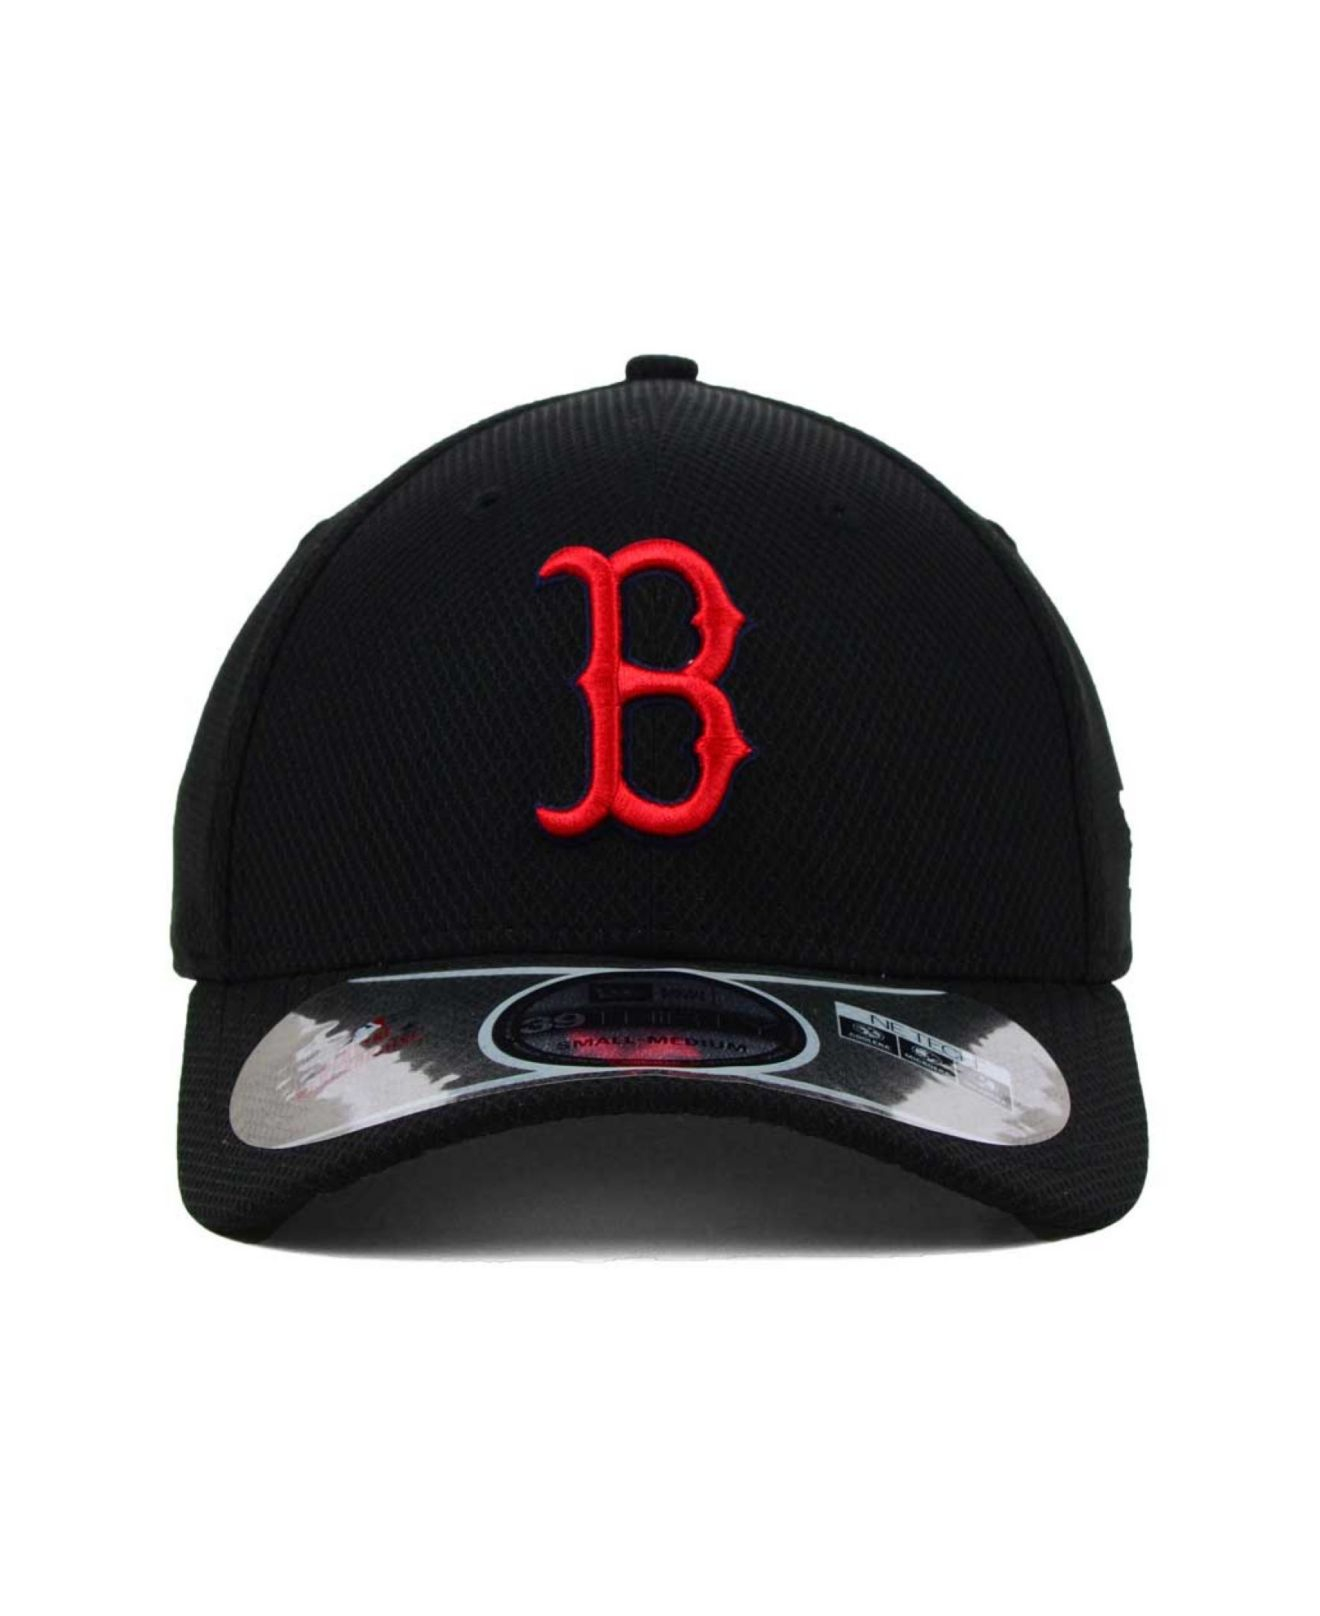 Lyst - KTZ Boston Red Sox Mlb Diamond Era Black 39thirty Cap in ... 9abf3cf90fe